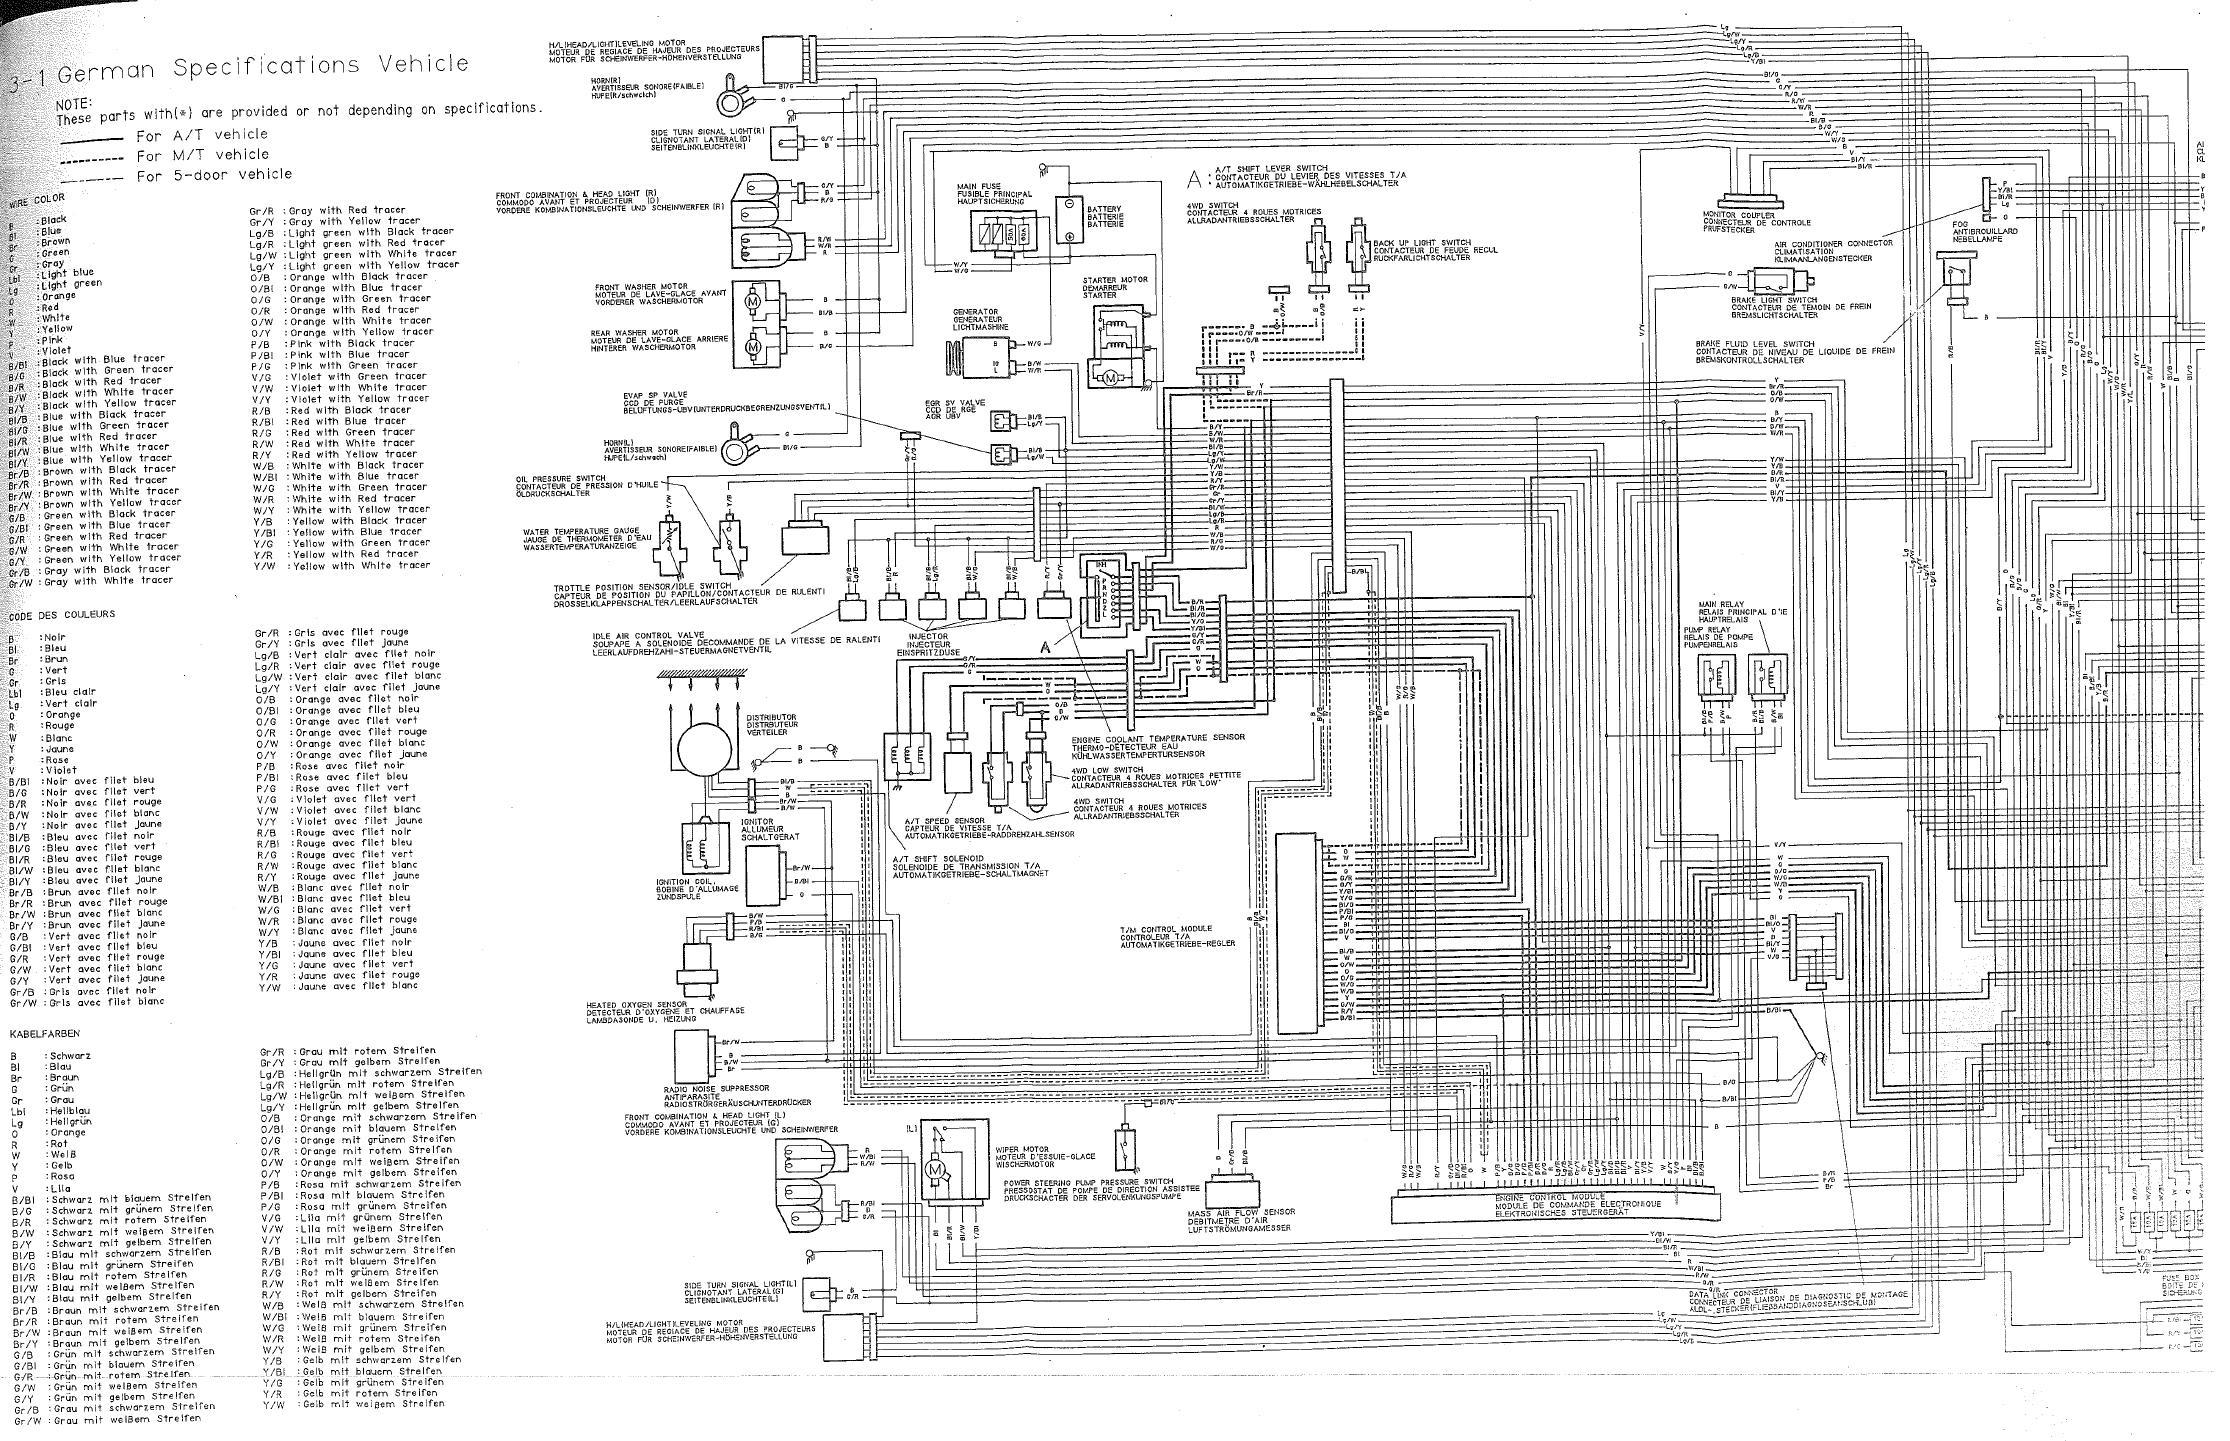 suzuki samurai wiringdiagram zaTSsqW suzuki samurai wiringdiagram image details 1988 suzuki samurai wiring diagram at bayanpartner.co